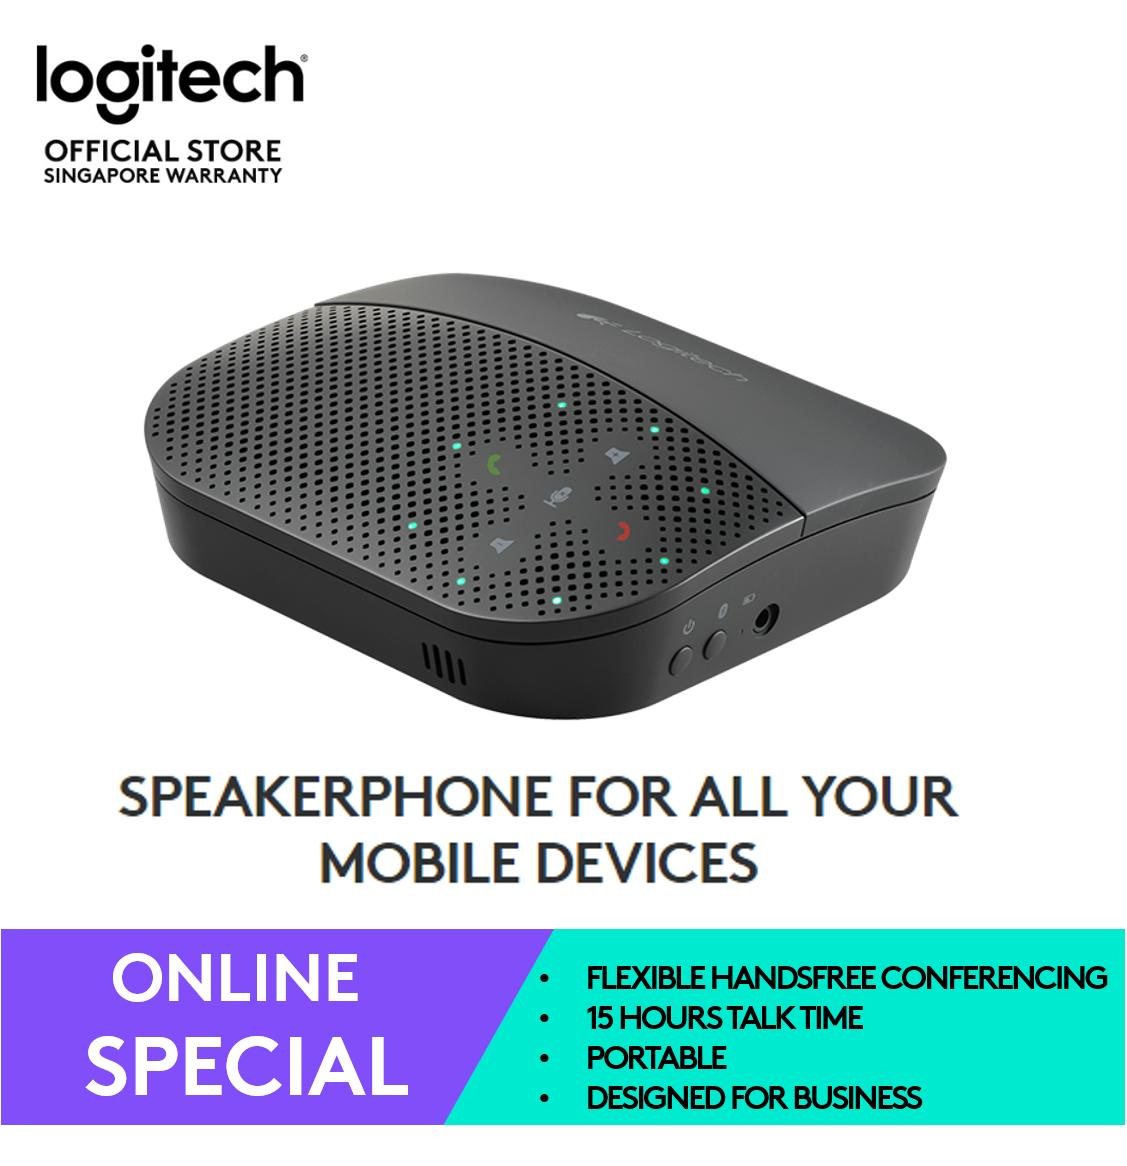 Logitech P710e Mobile Conference Speakerphone